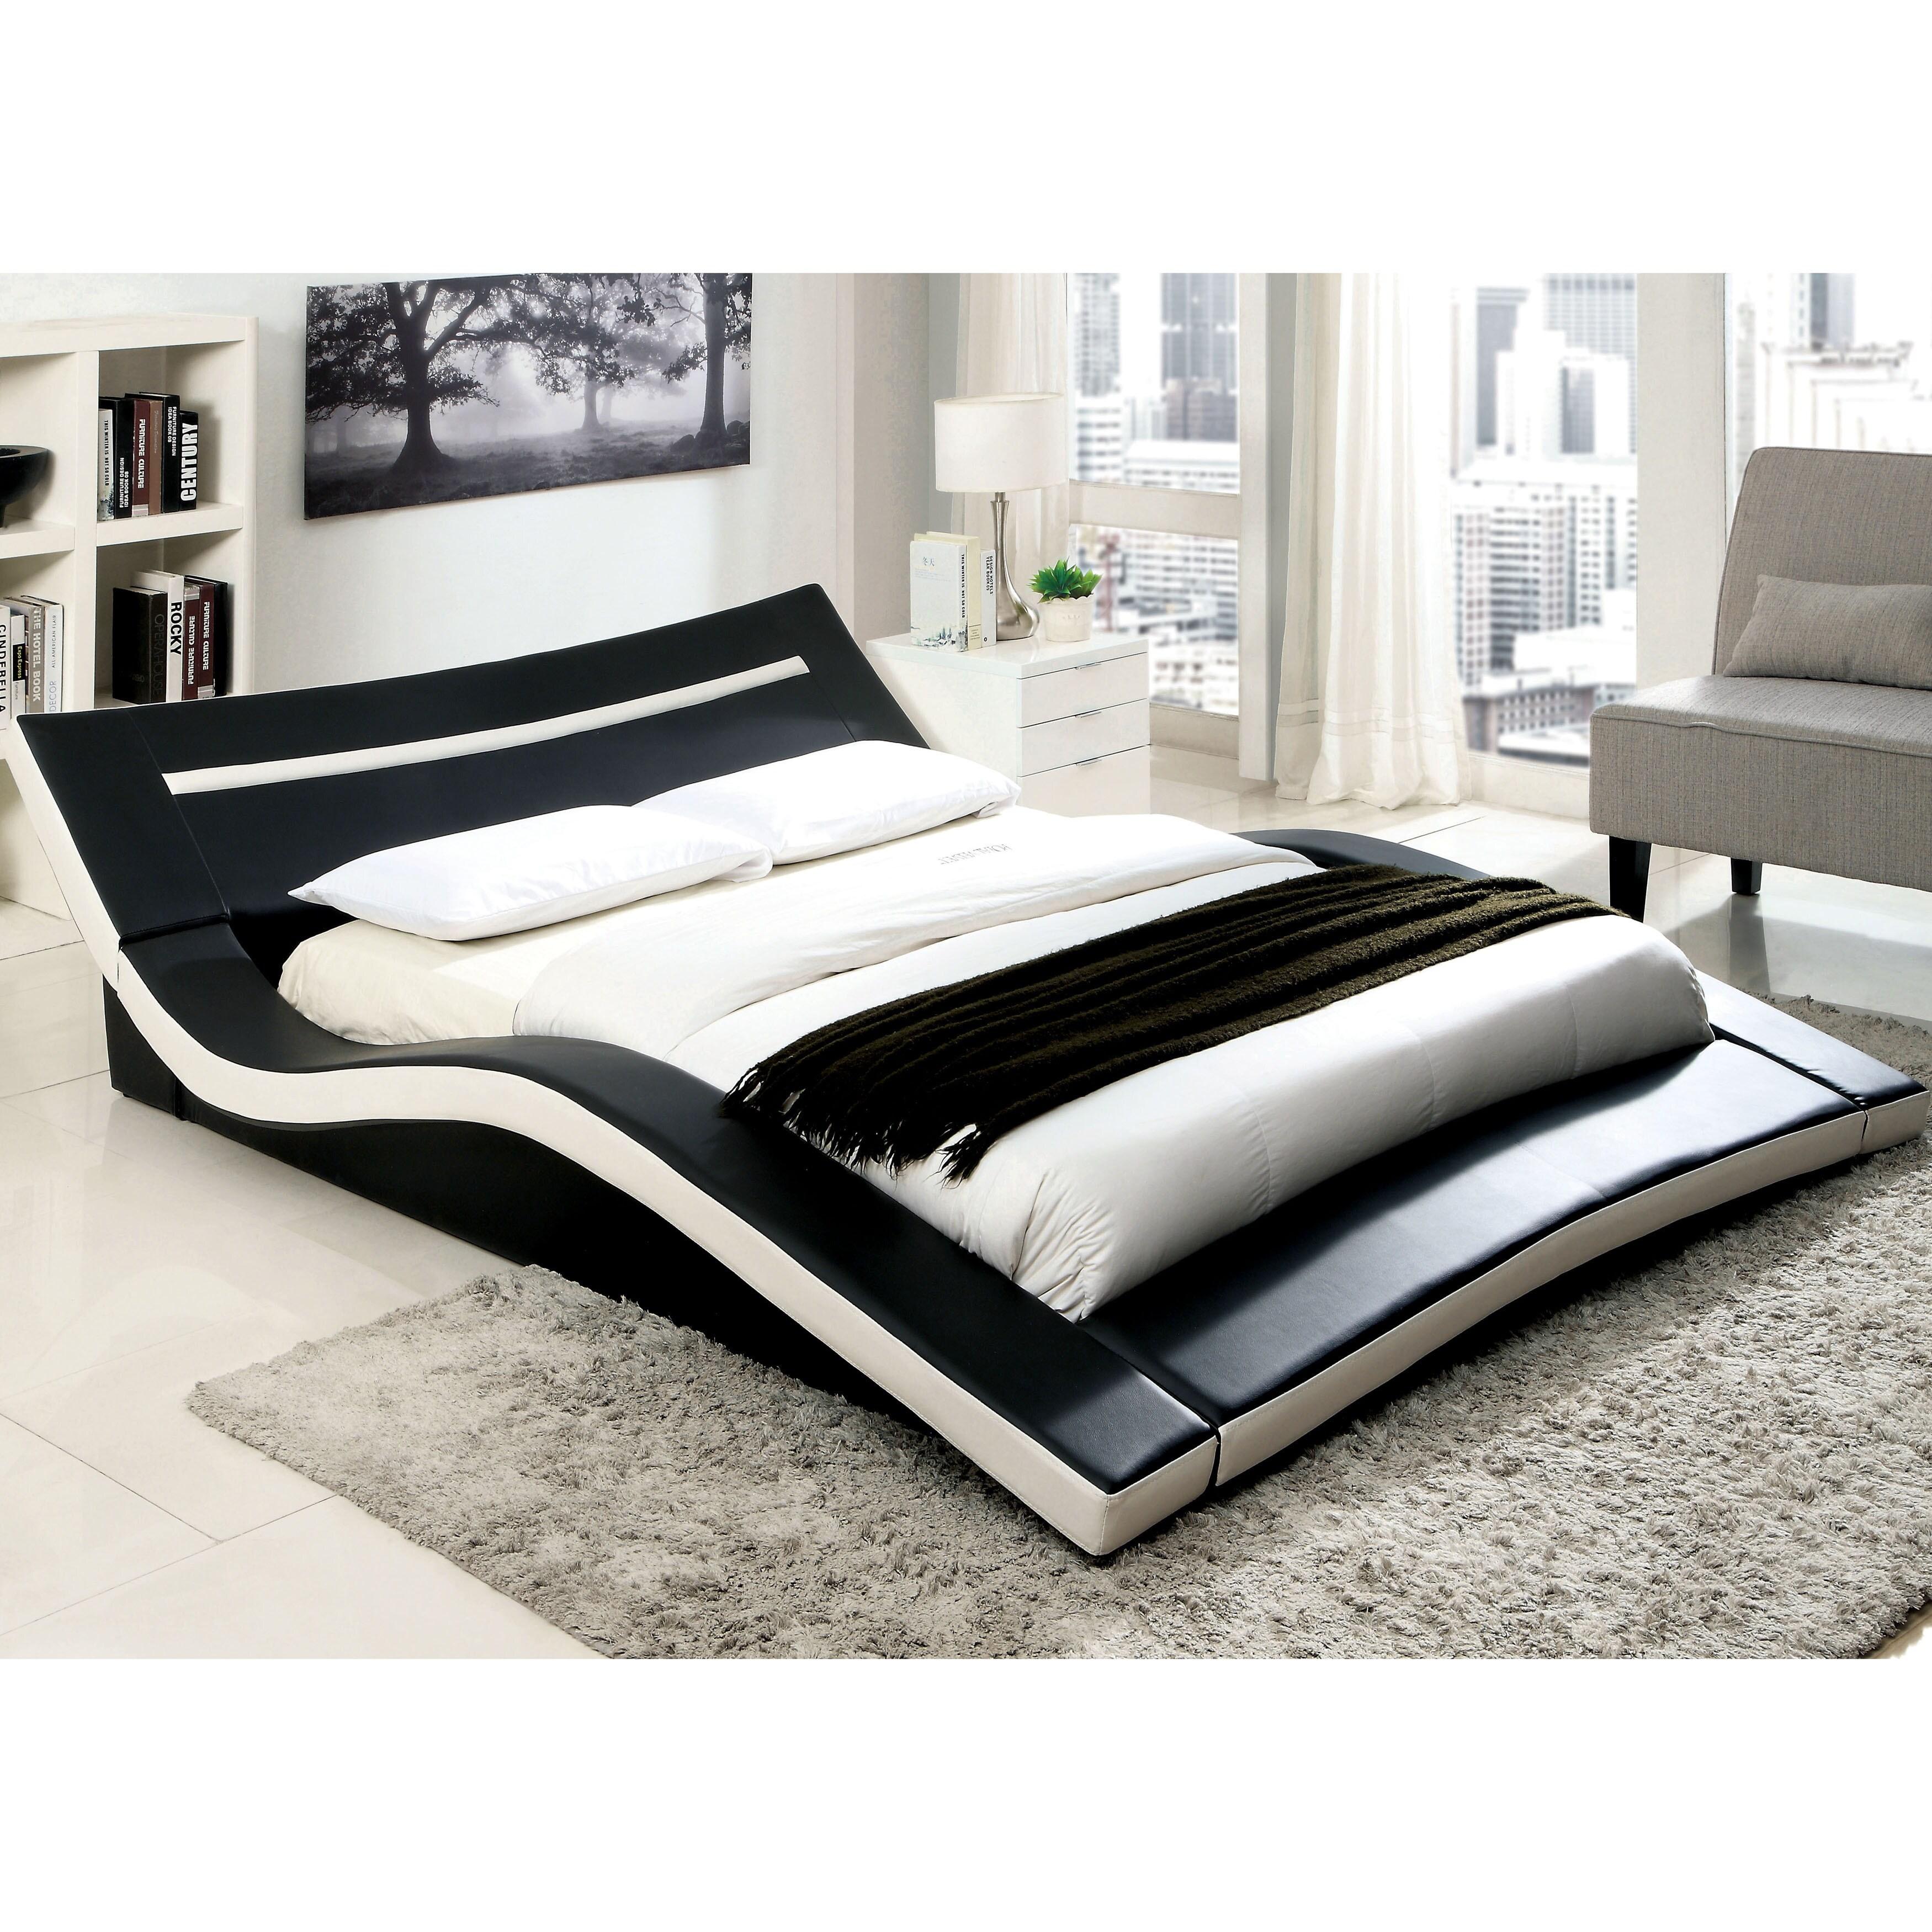 Blaires Modern Black Low Profile Platform Bed By Foa